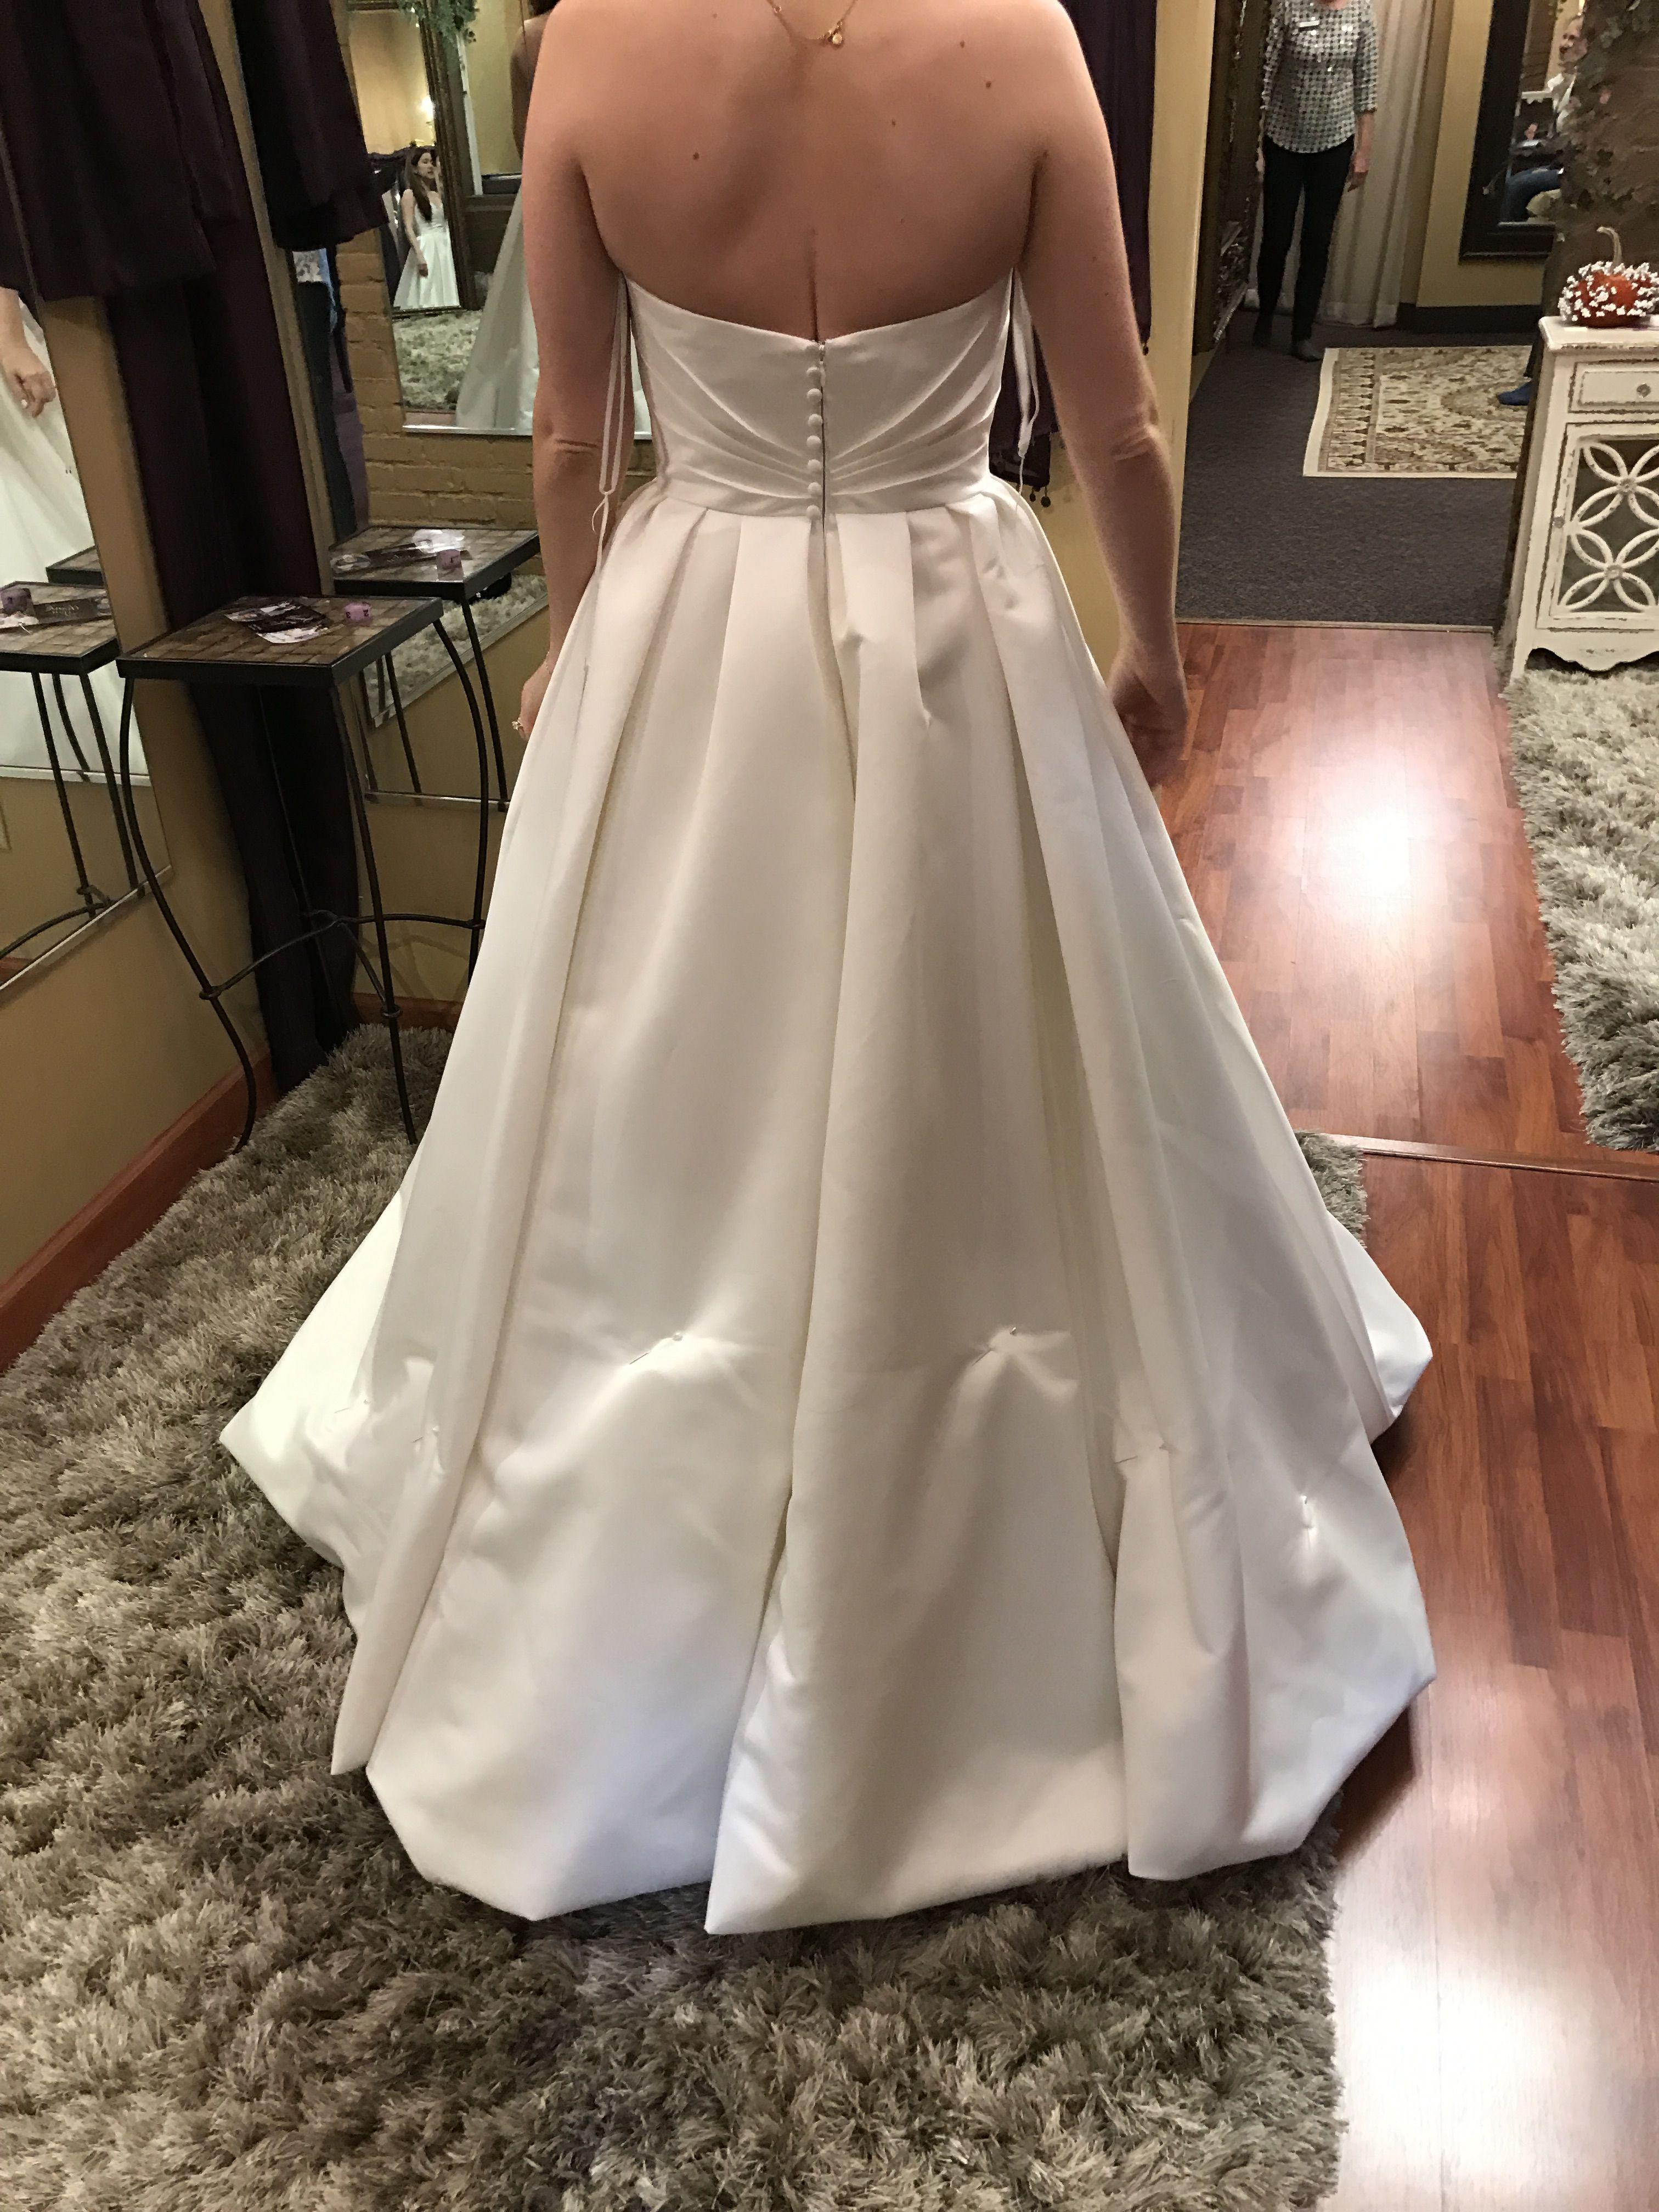 French Bustle On Lace Wedding Dress Wedding Dress Bustle Wedding Dresses Wedding Dress Alterations